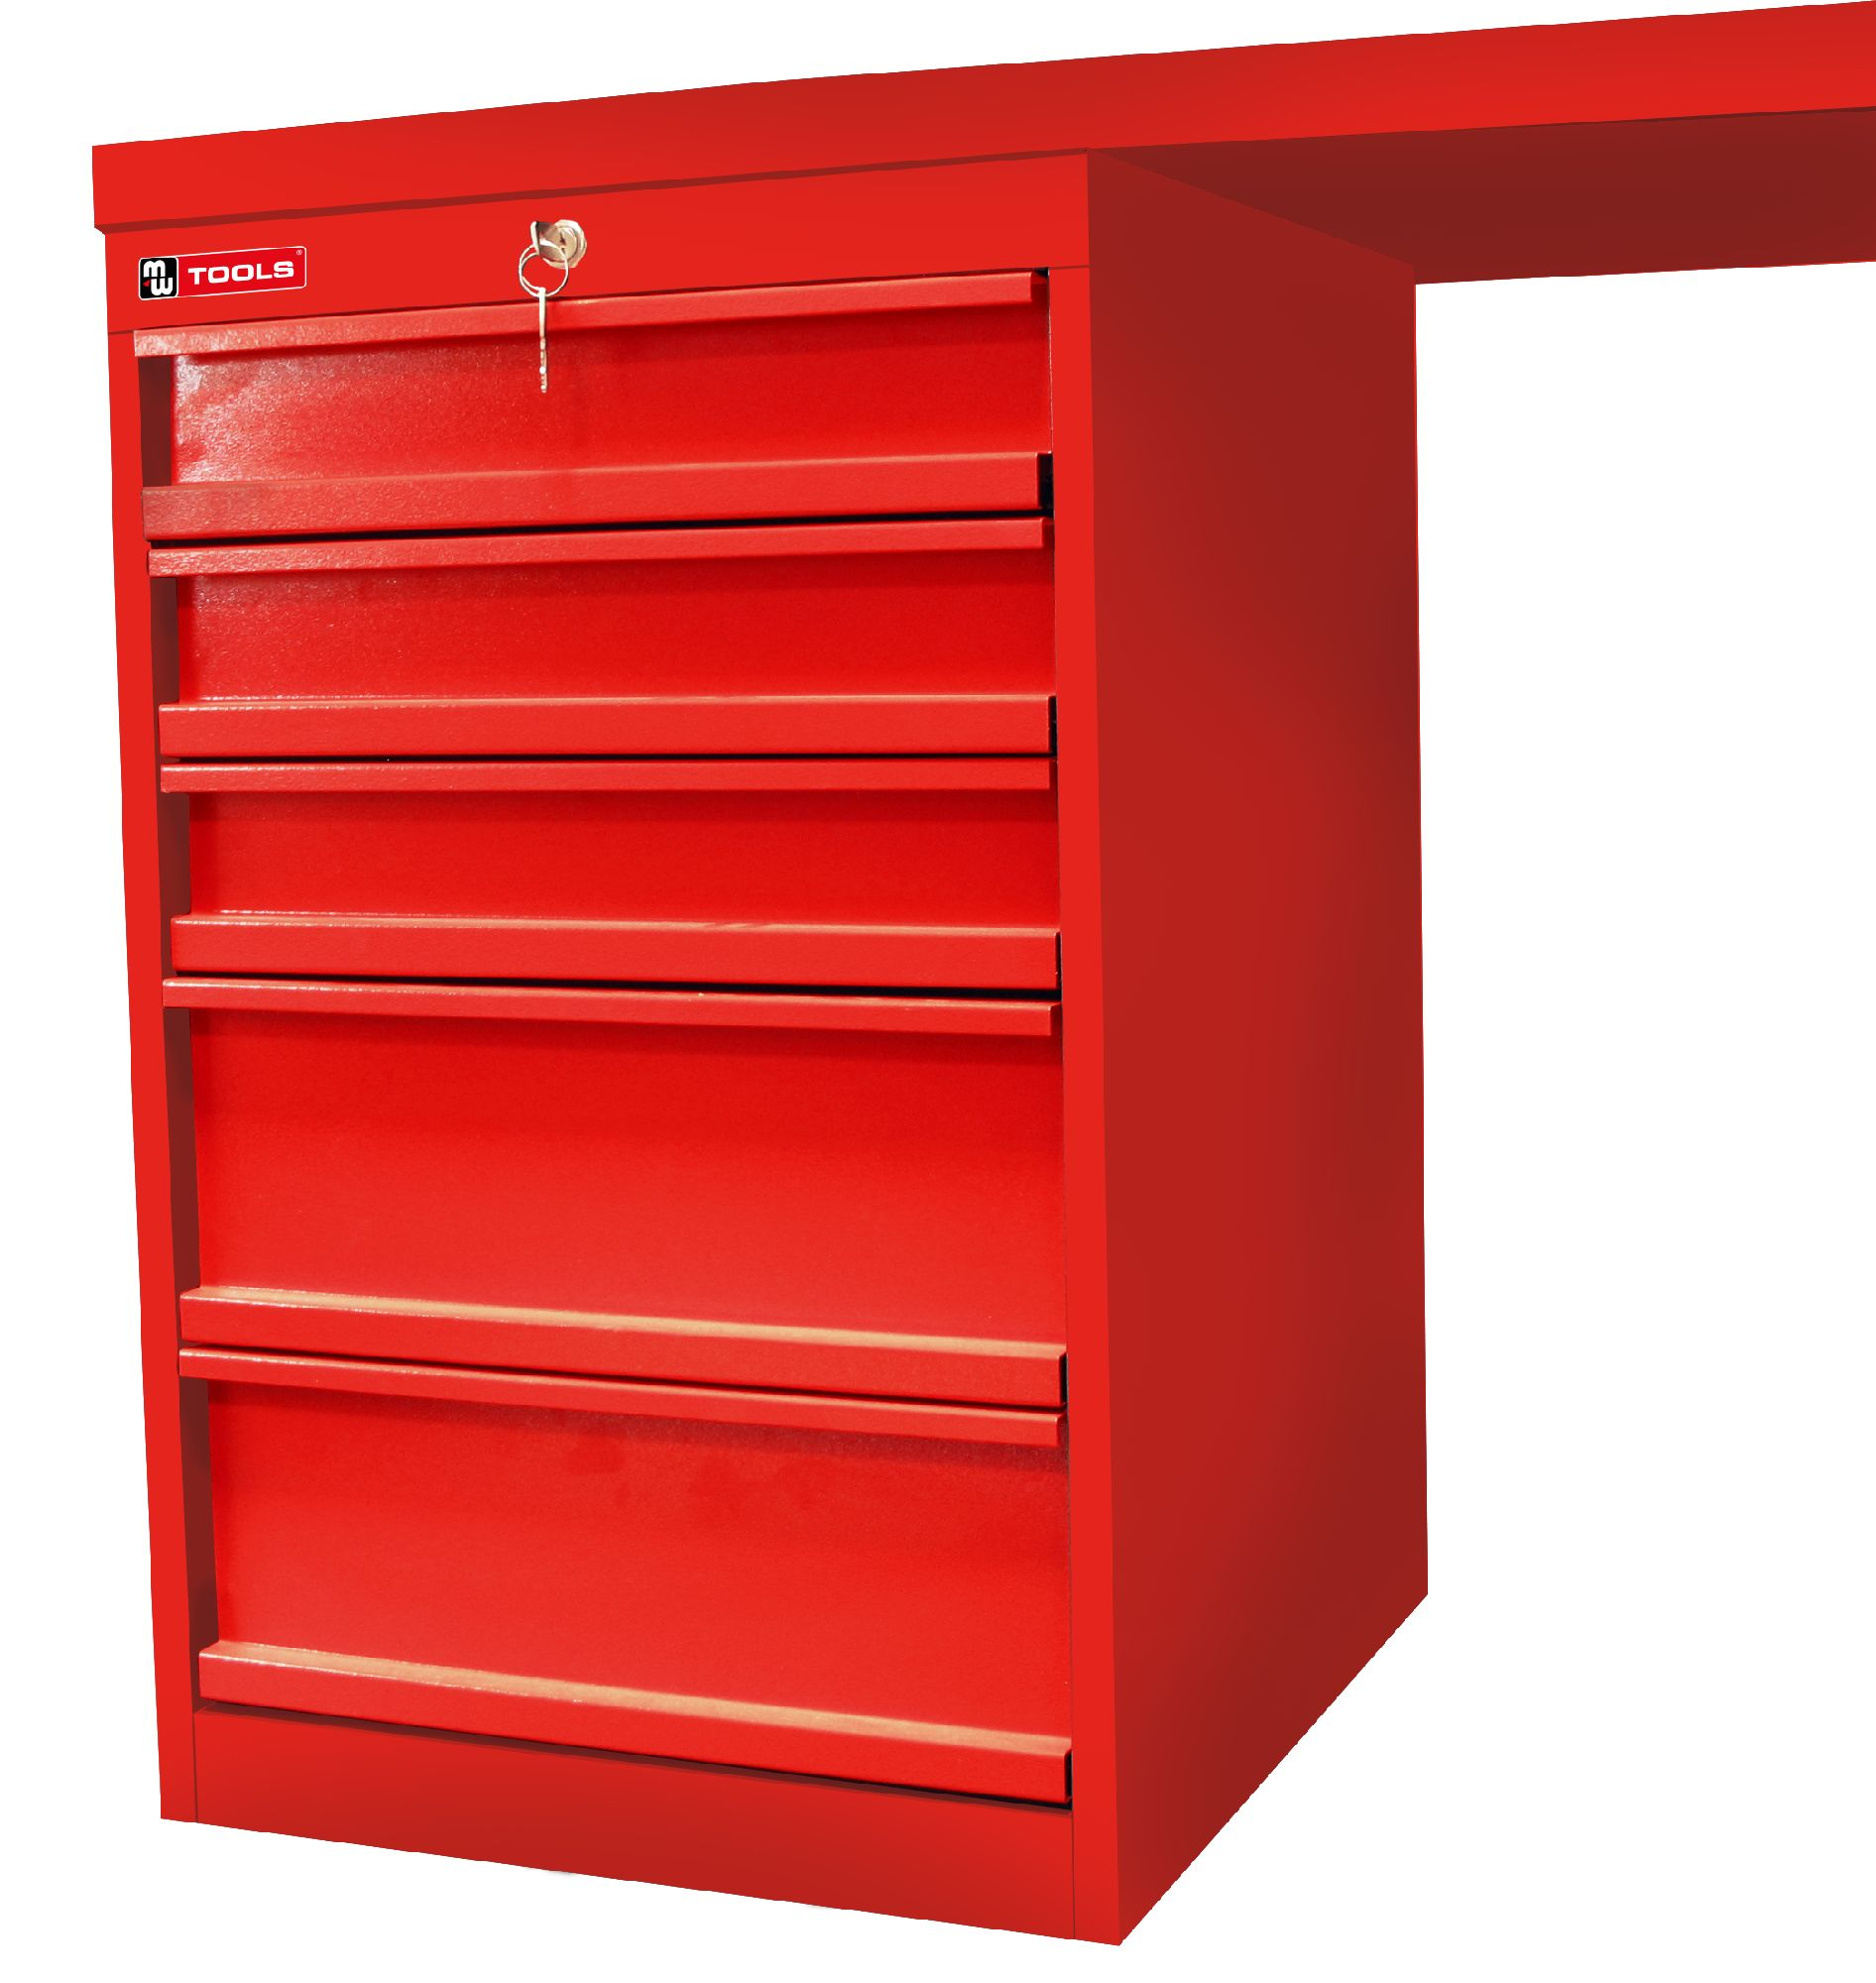 Modular modl mw armoires tiroirs mobilier d 39 atelier for Ladeblok garage